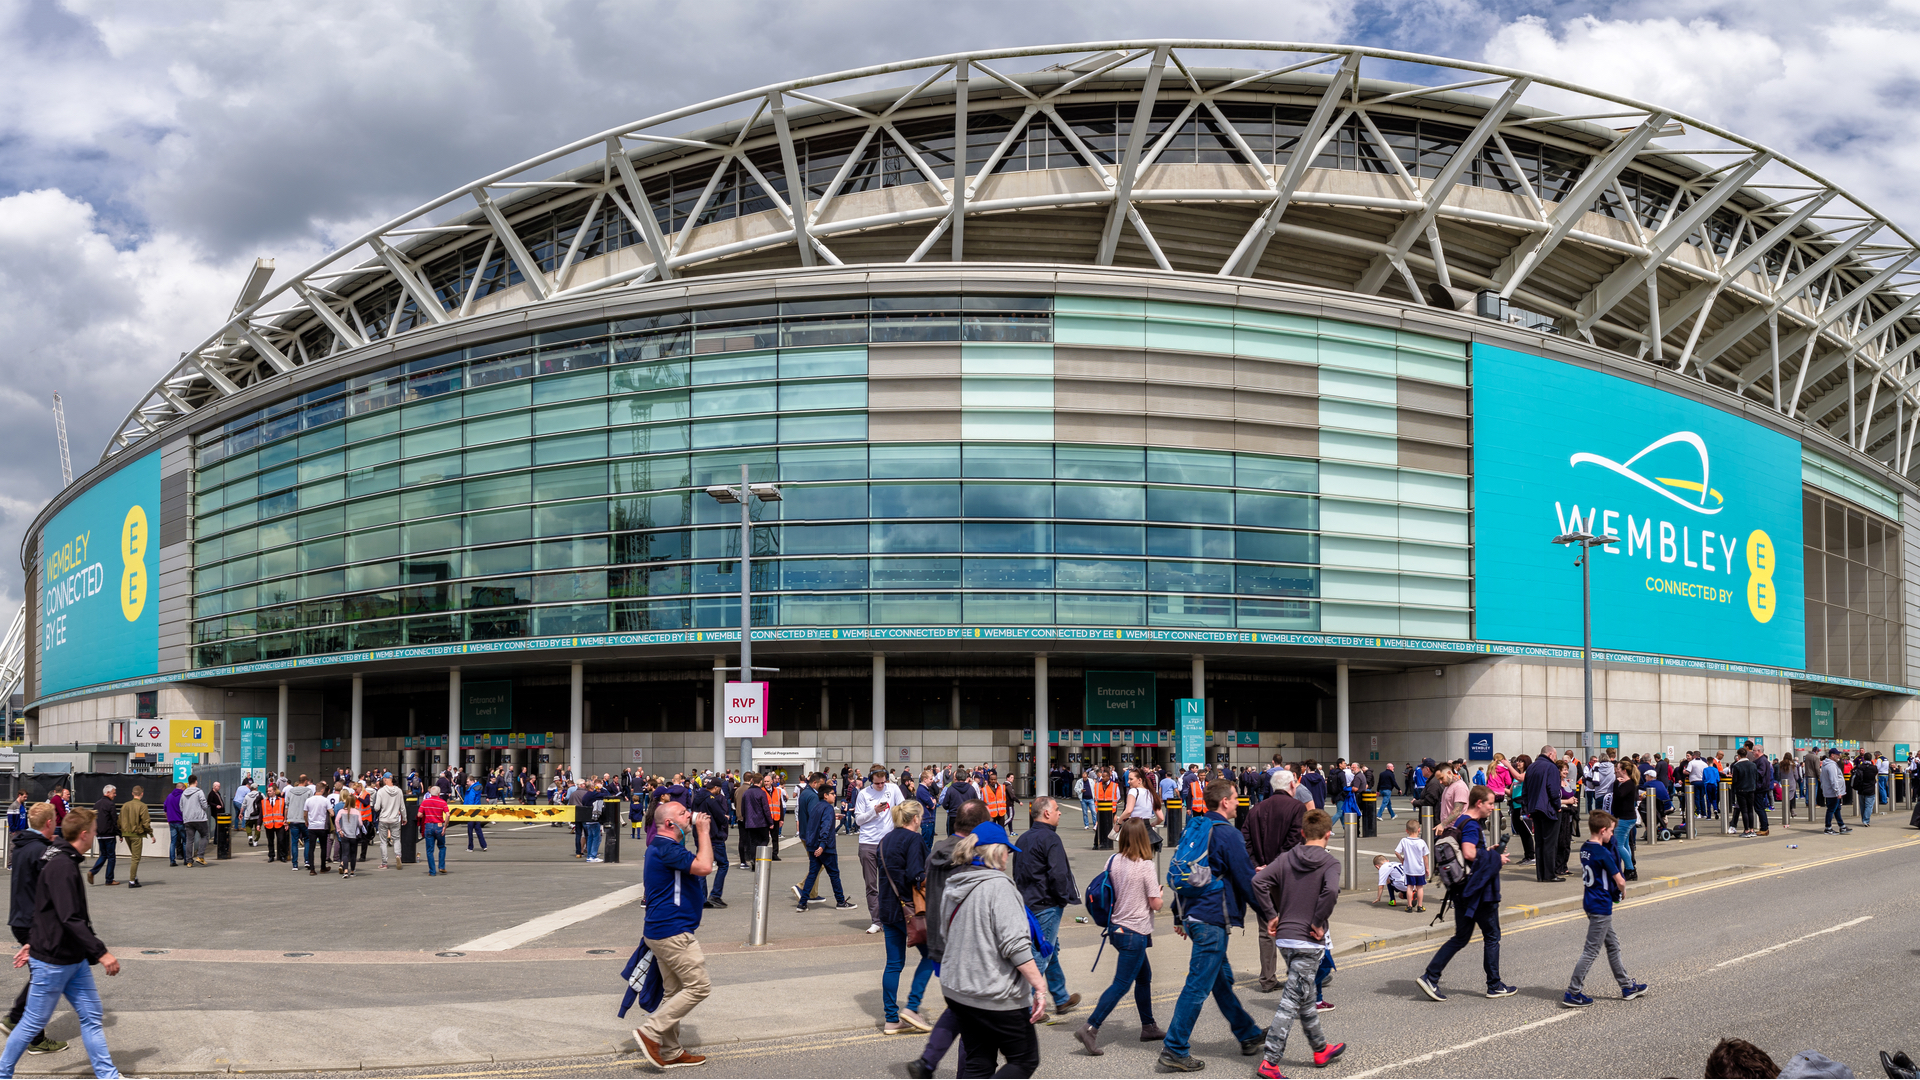 fans at Wembley Stadium